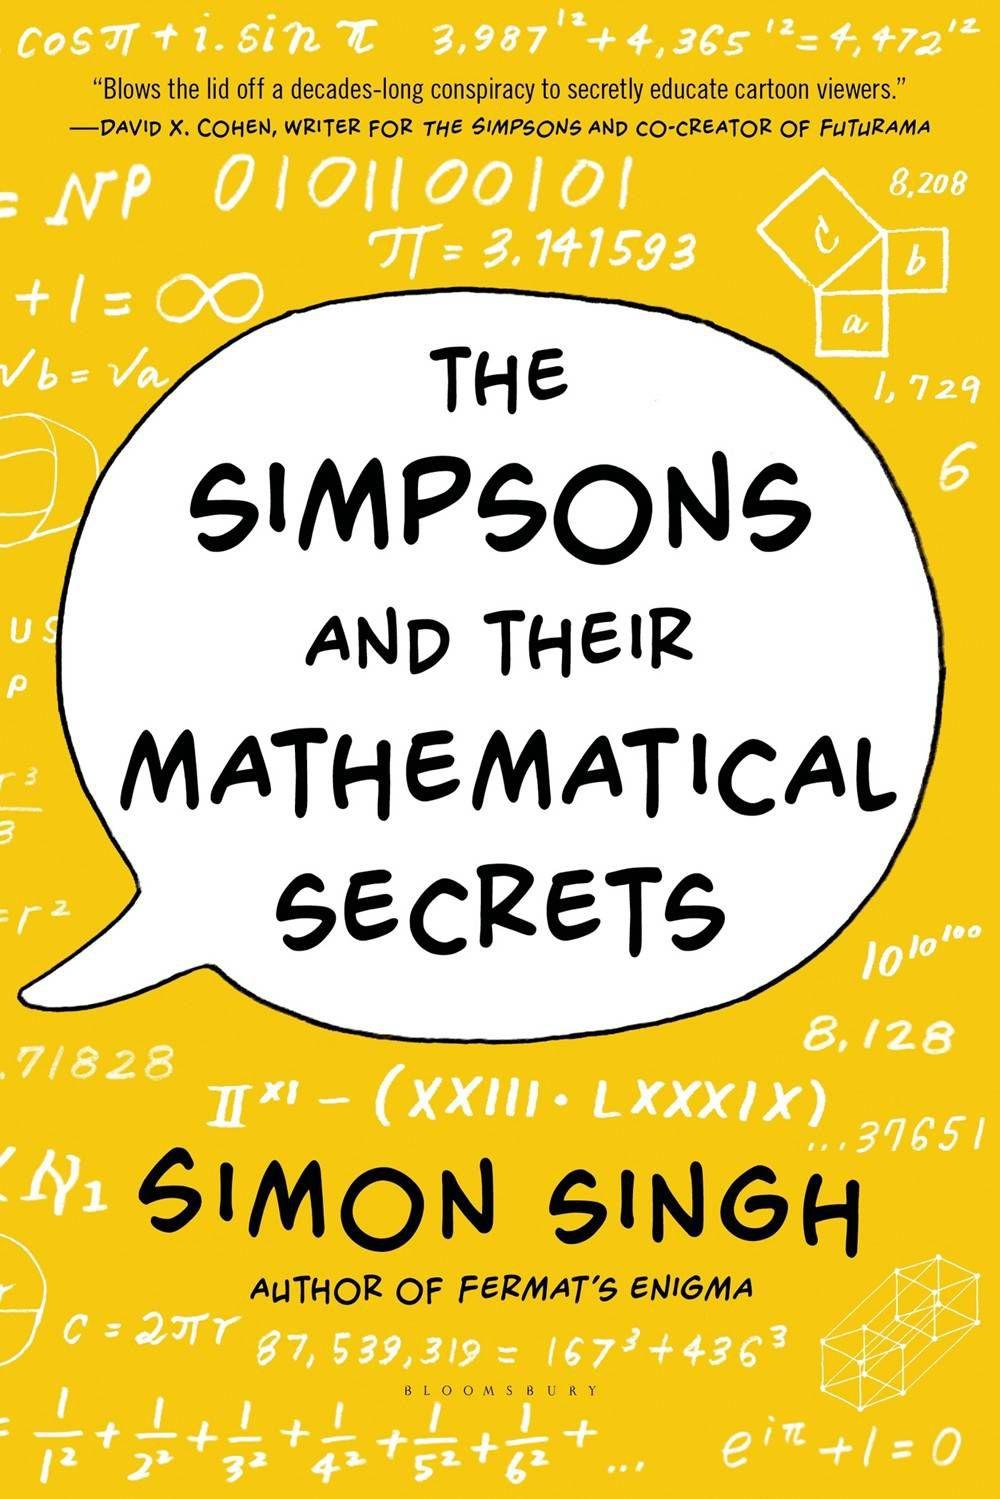 simpsons - simon singh